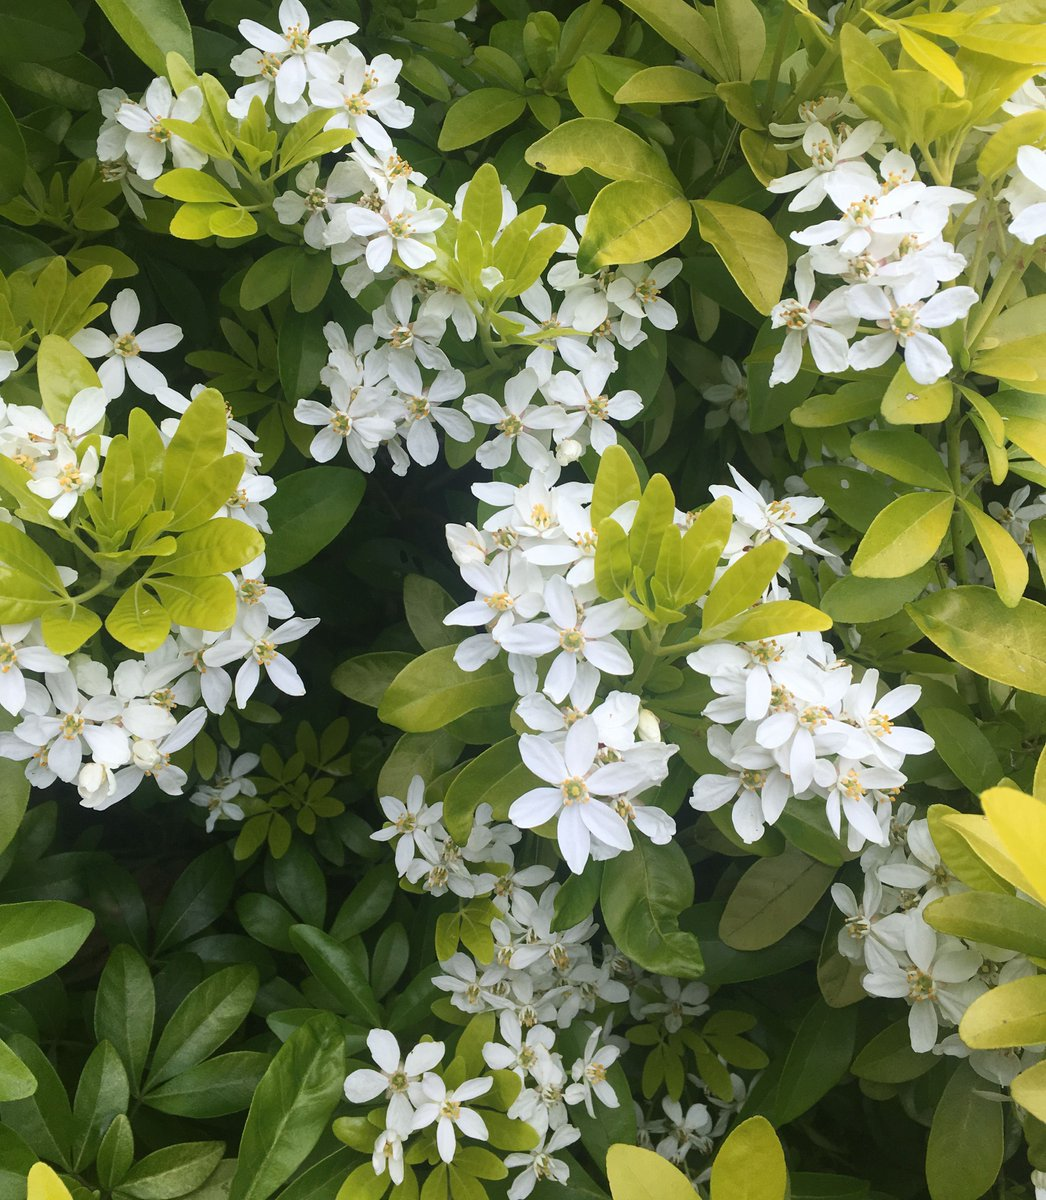 Suttons On Twitter Choisya Sundance Is Now Flowering In The Garden